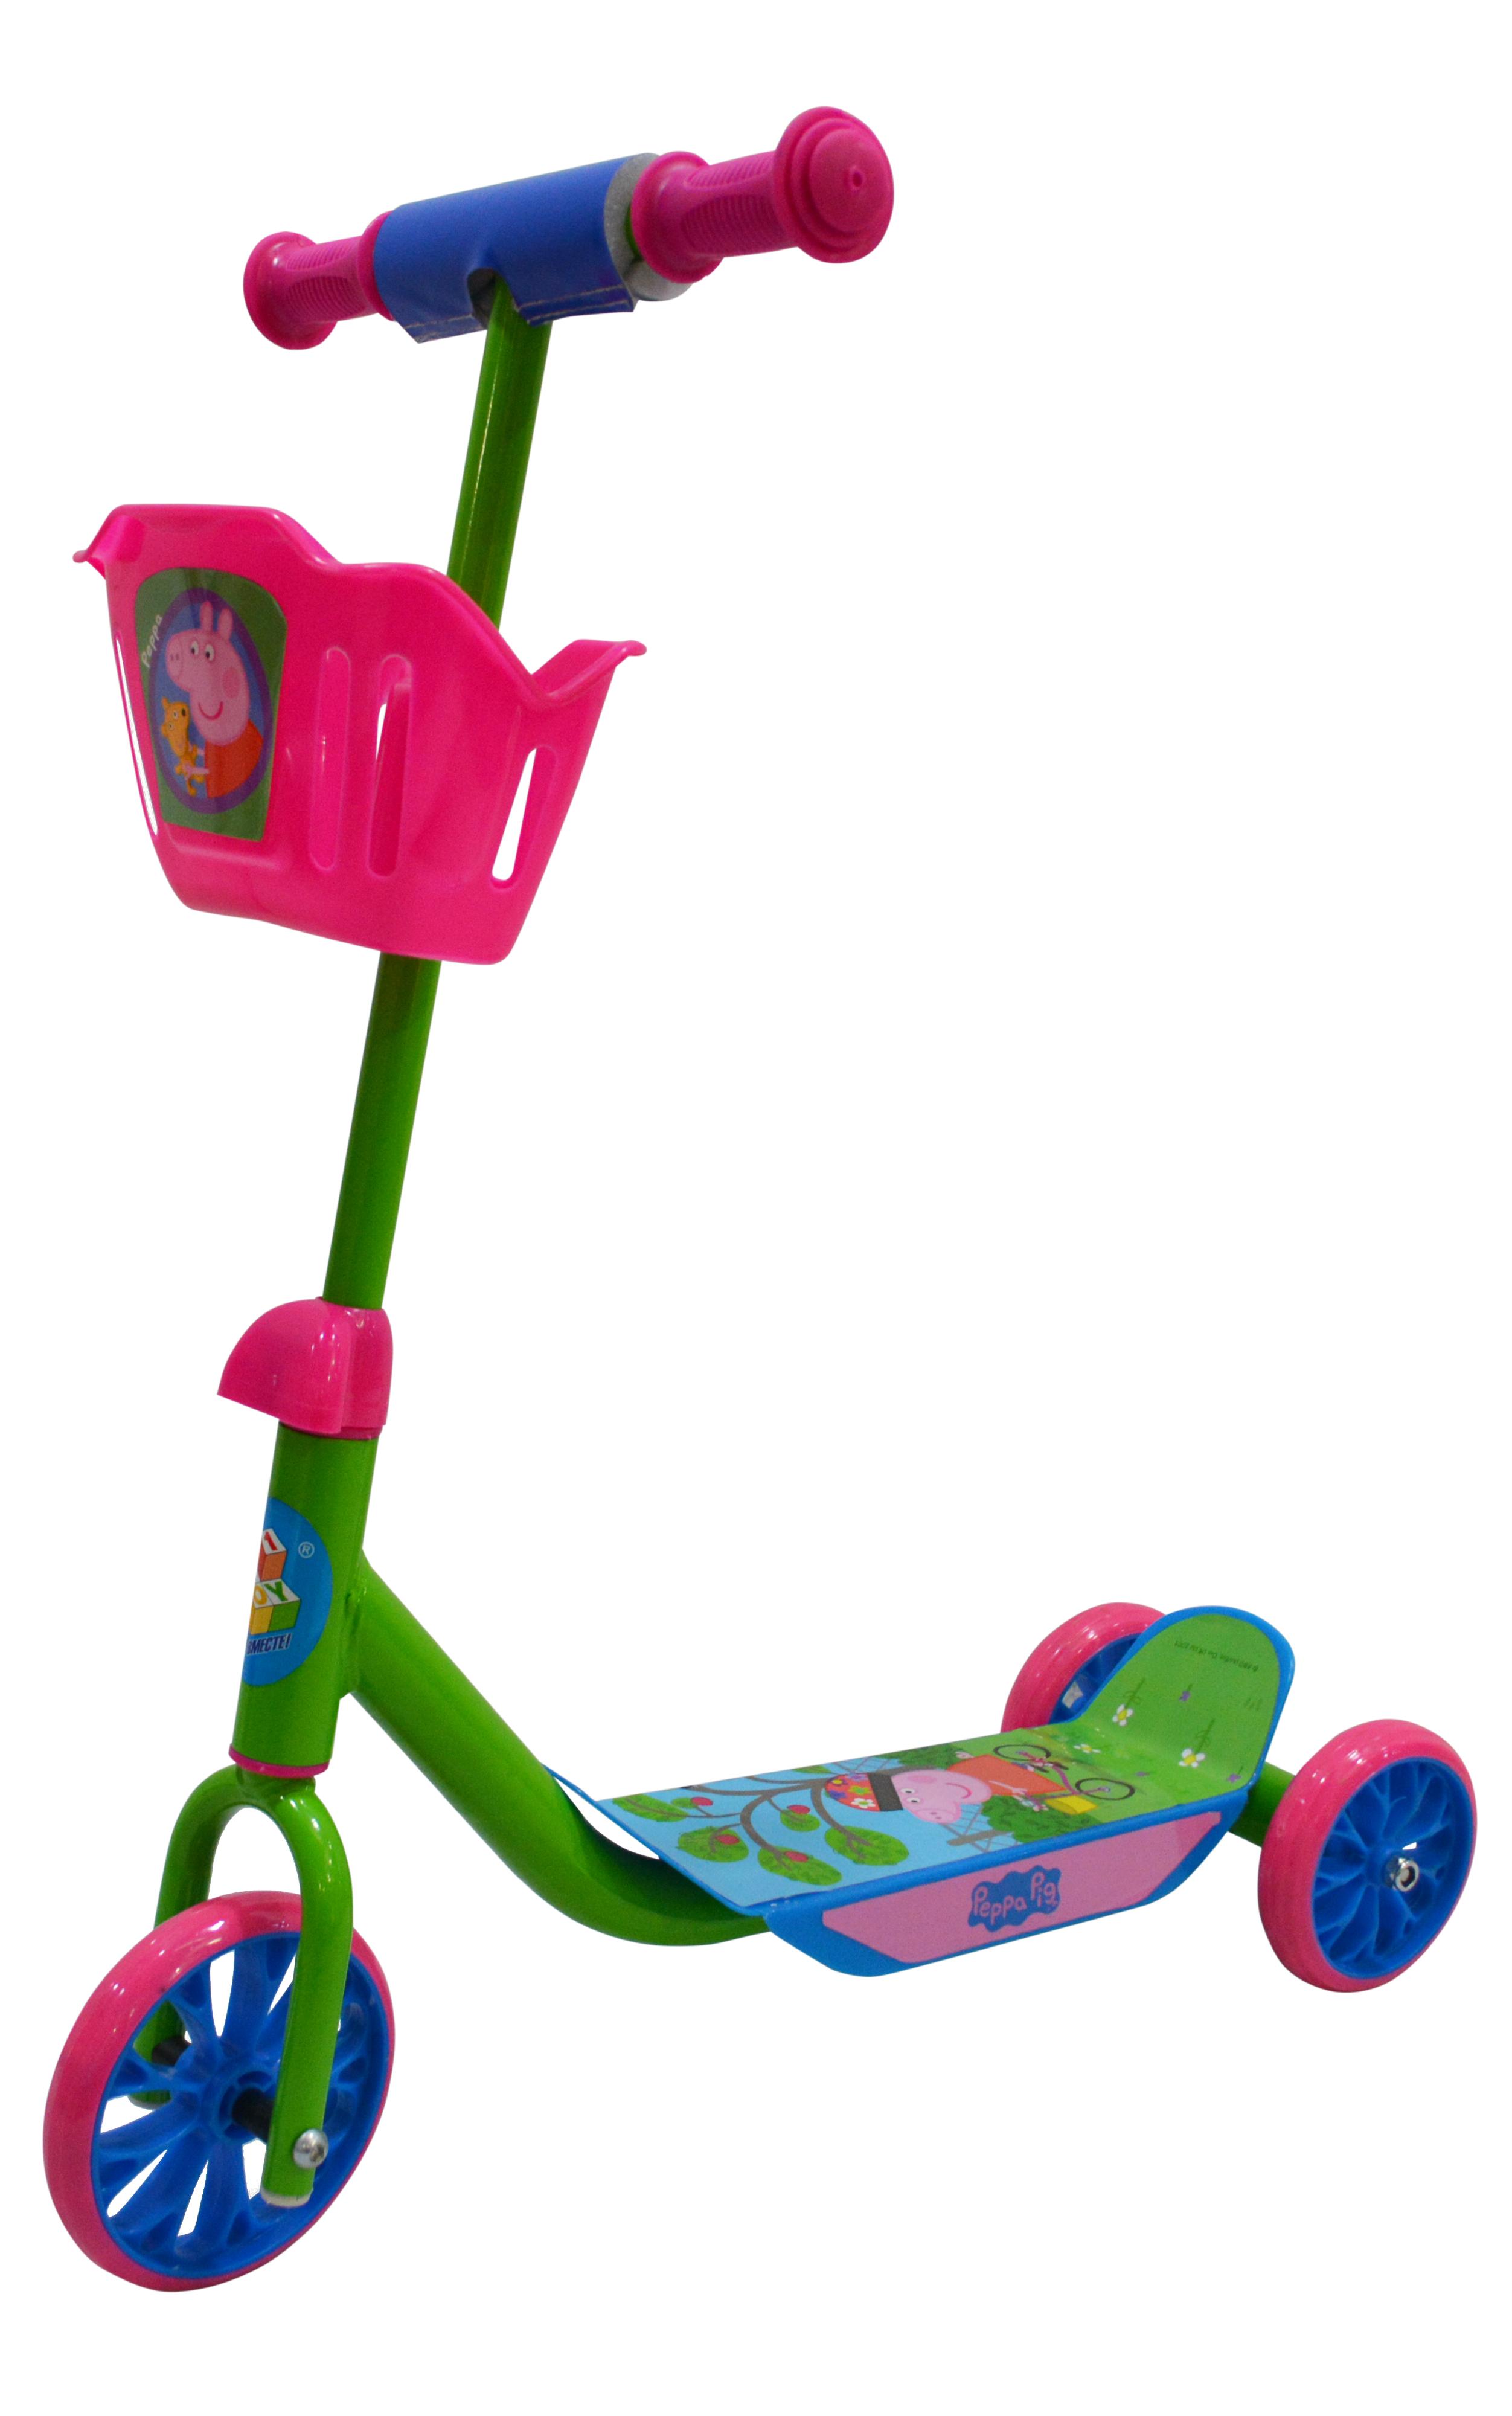 Самокаты 1toy Peppa самокат трехколесный 1 toy т57644 peppa